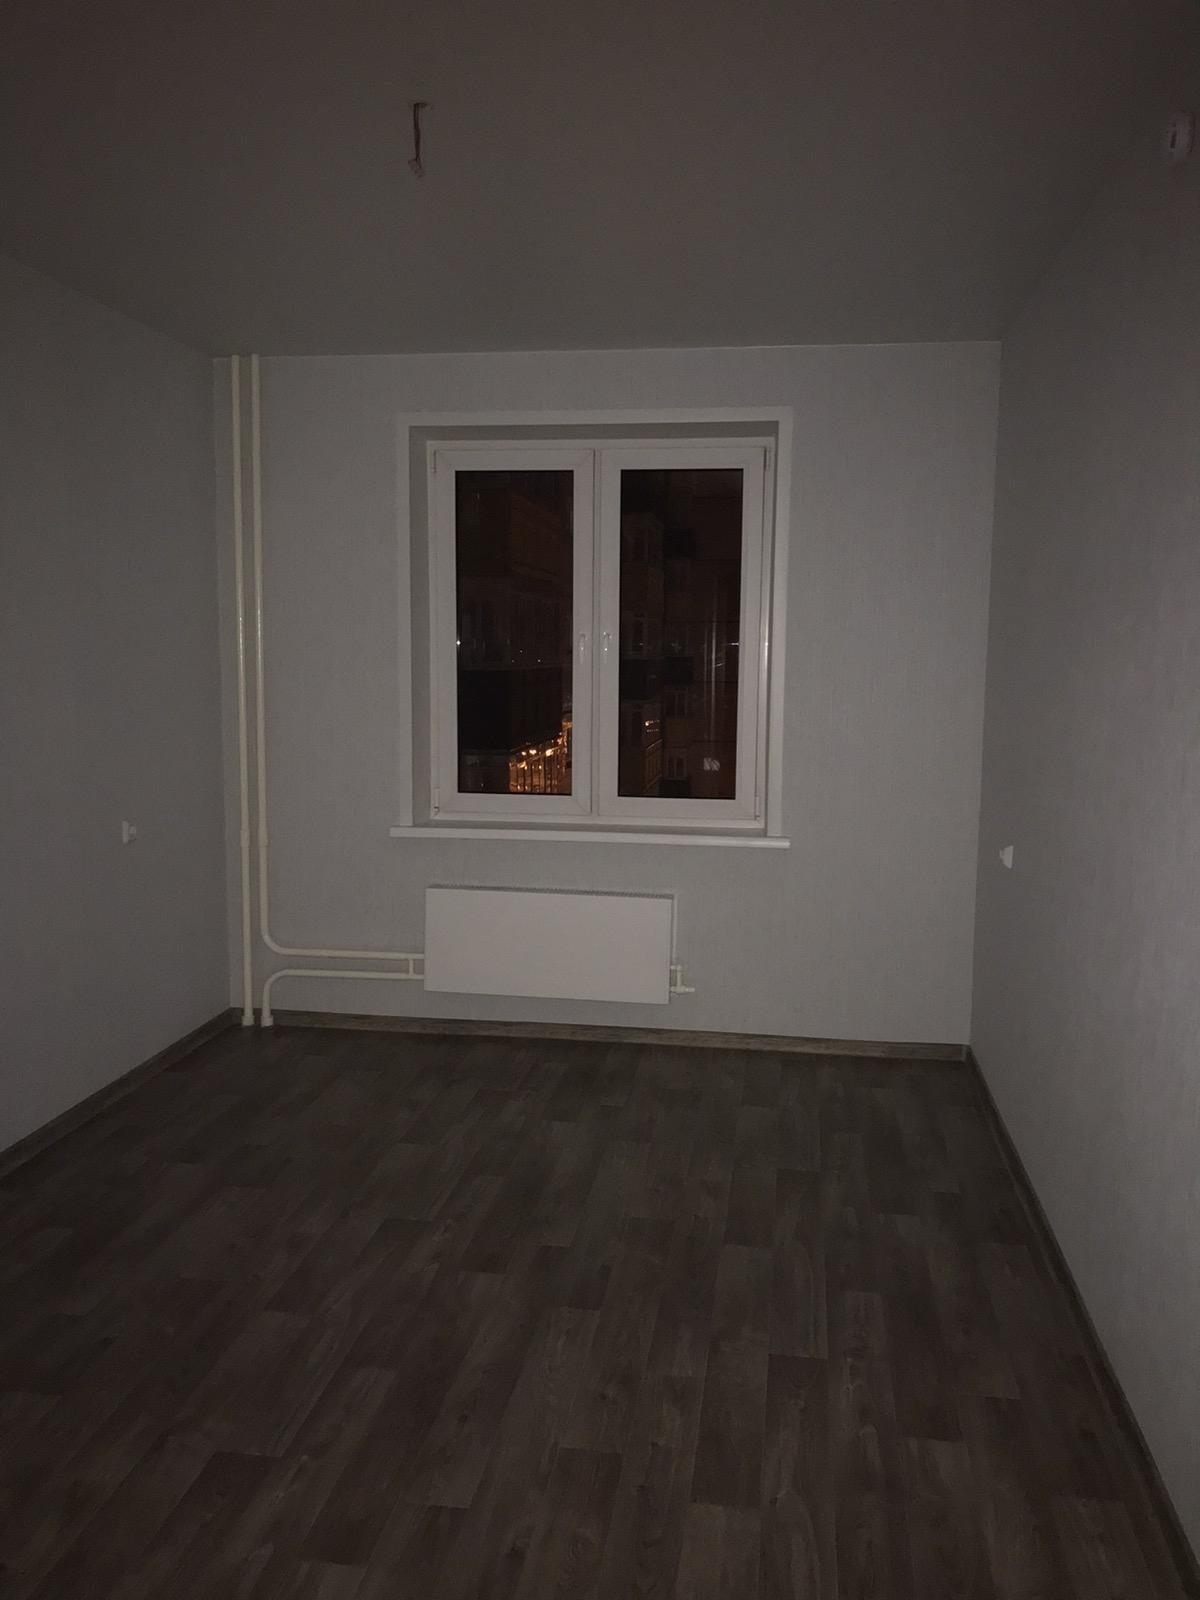 3к квартира улица Партизана Железняка, 40б   22000   аренда в Красноярске фото 0